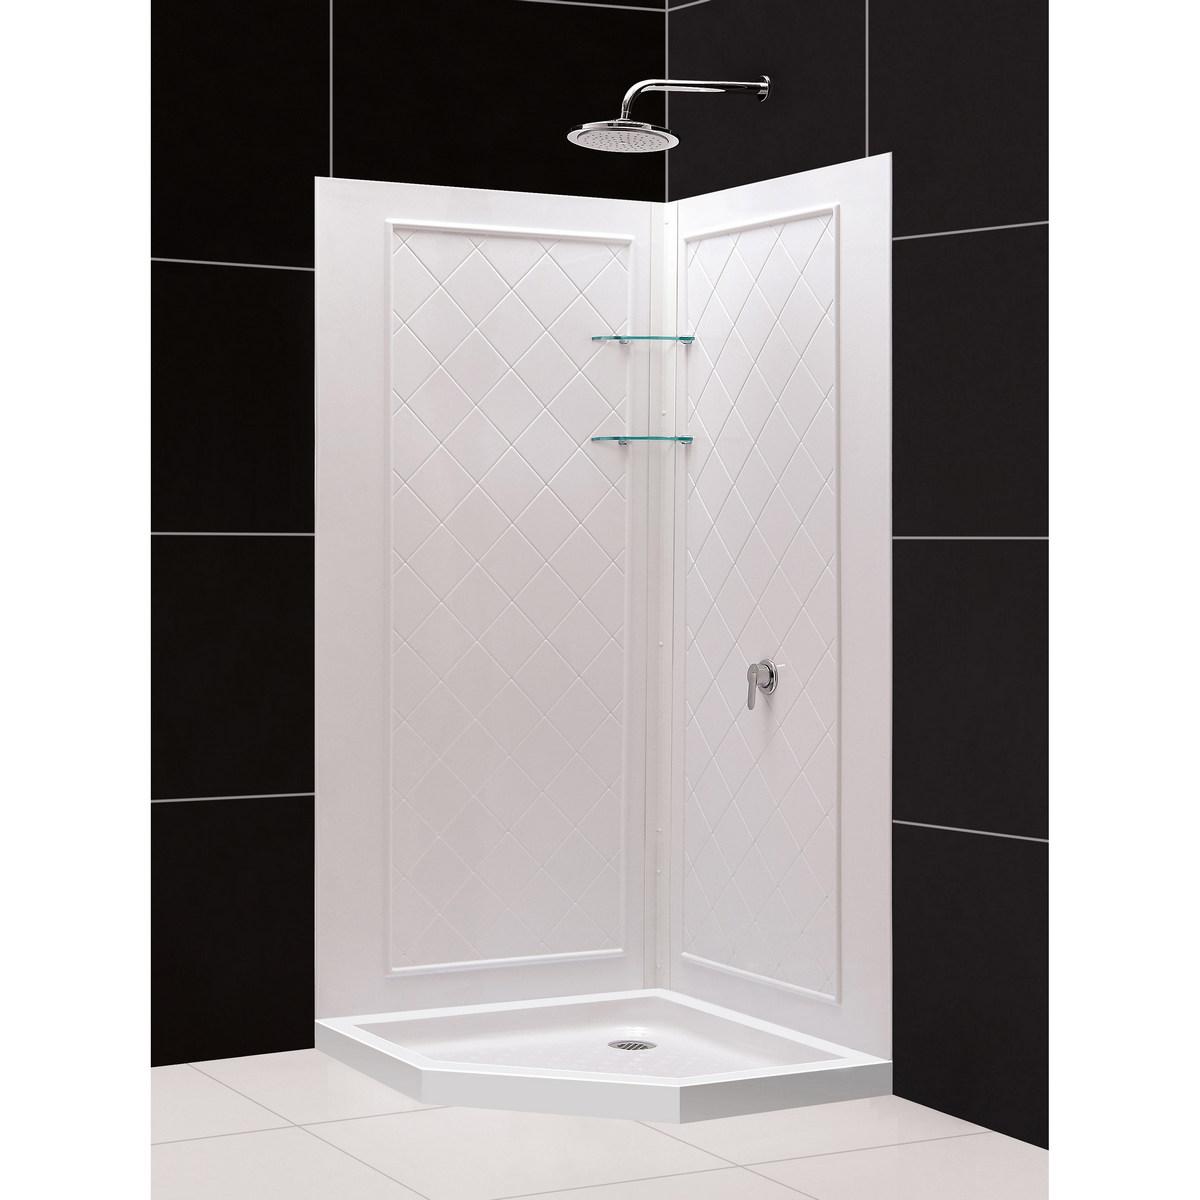 Dreamline Neo Angle Shower Base Qwall Acrylic Corner Backwall Kit White